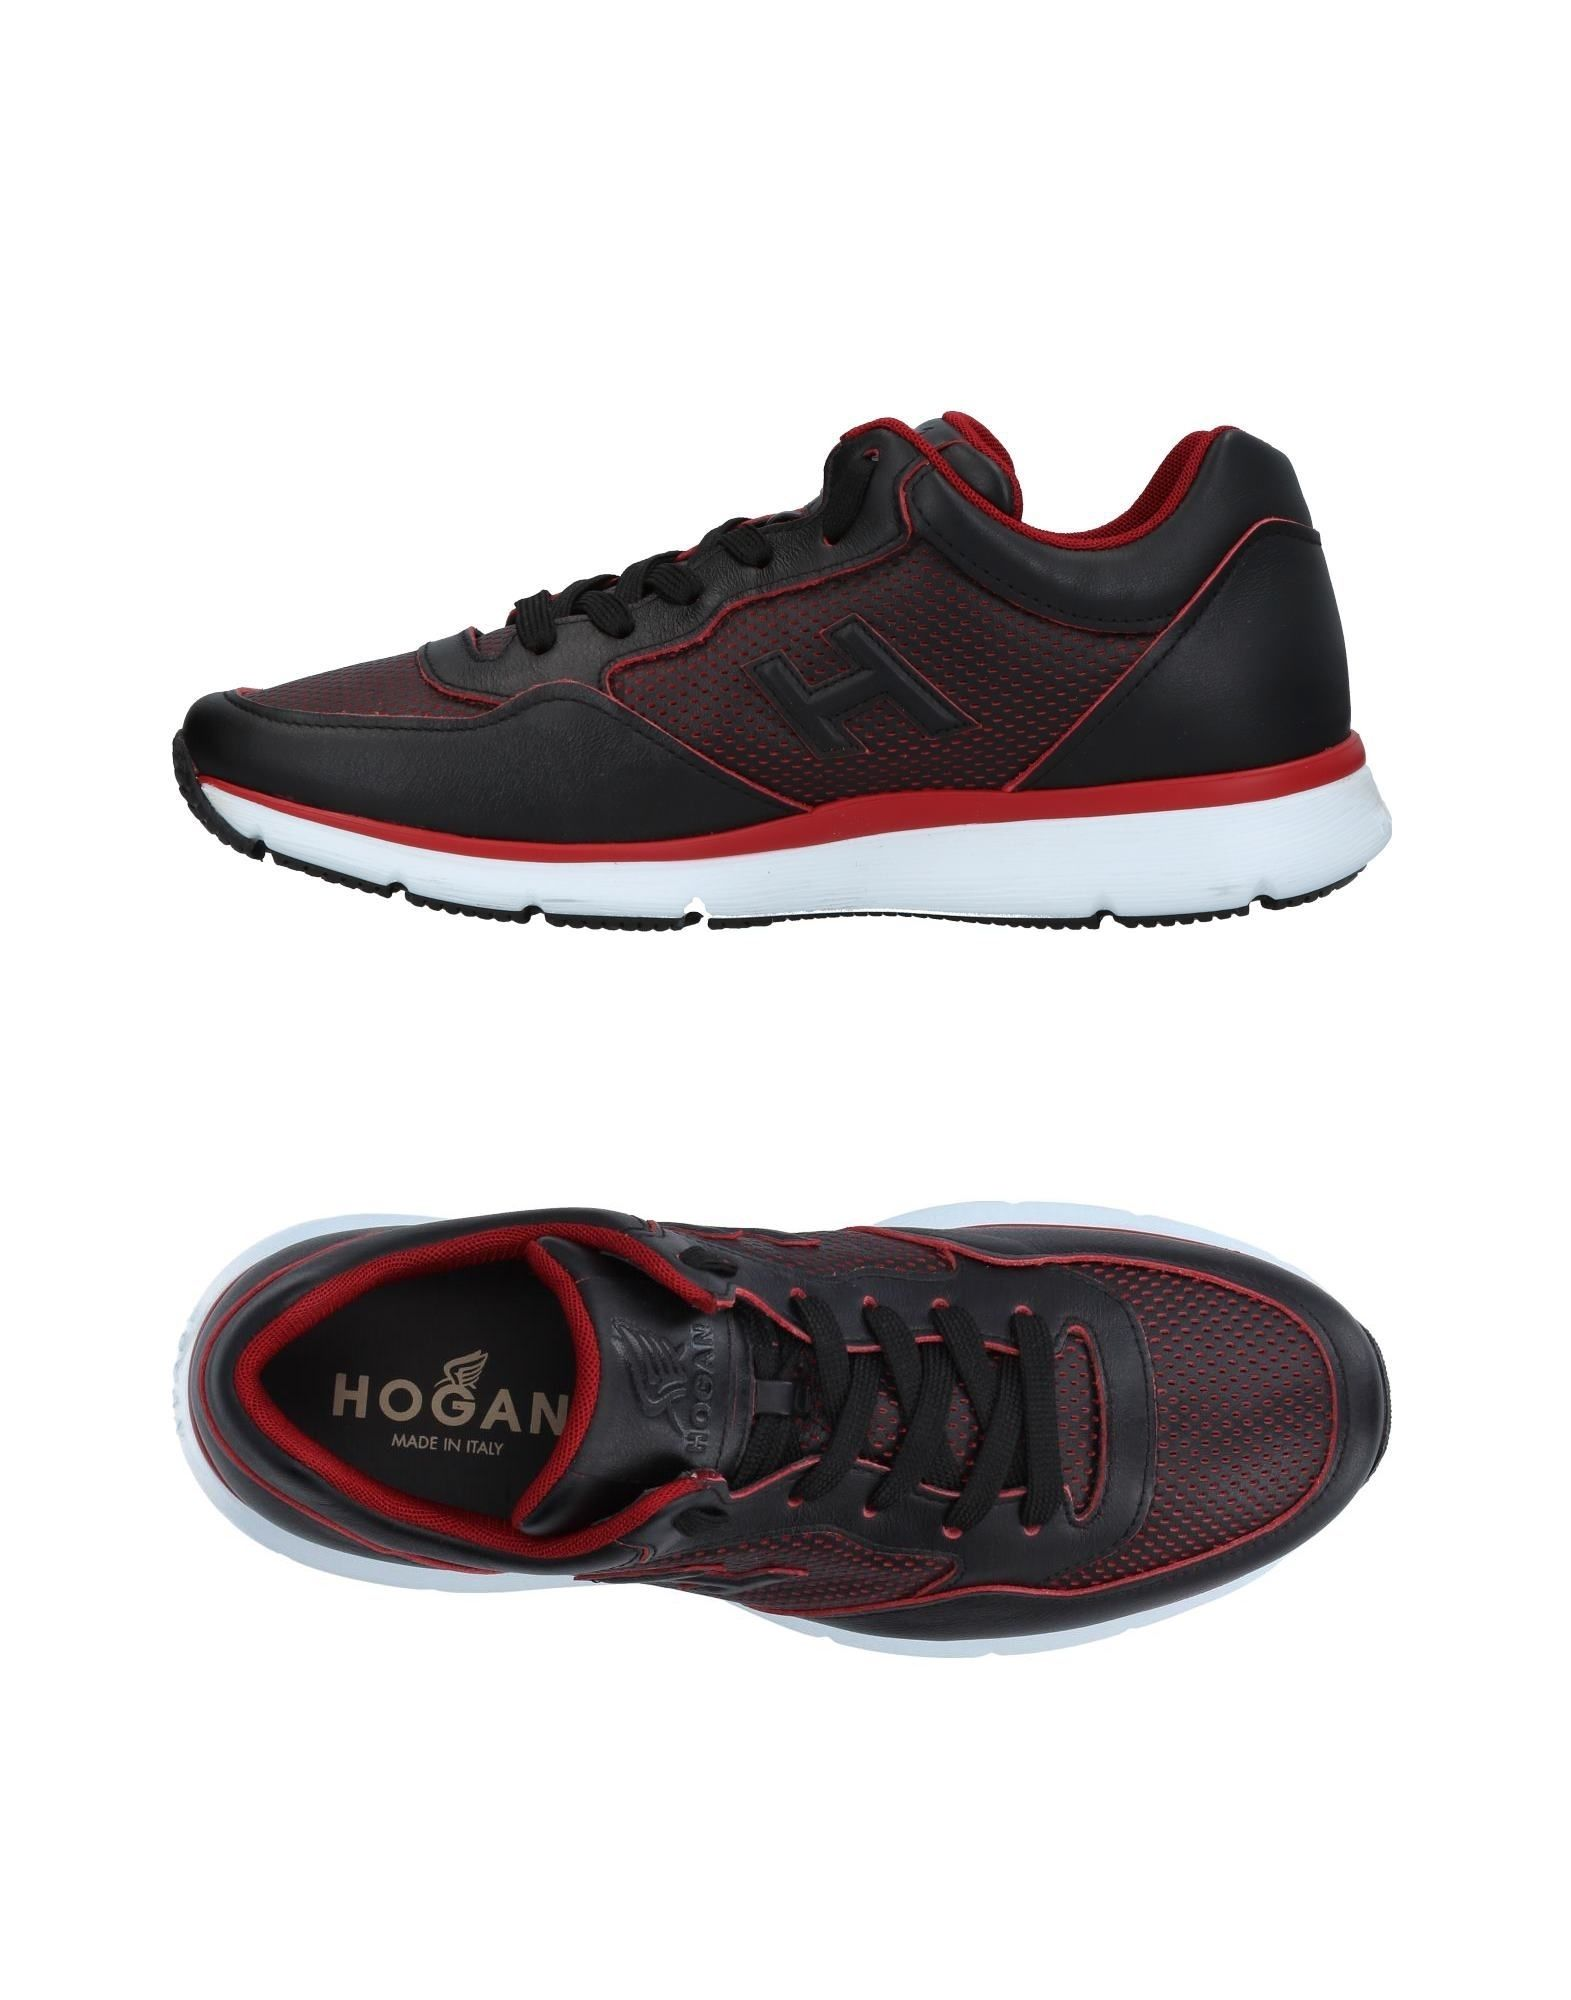 Hogan Sneakers Herren  11371923RX Gute Qualität beliebte Schuhe